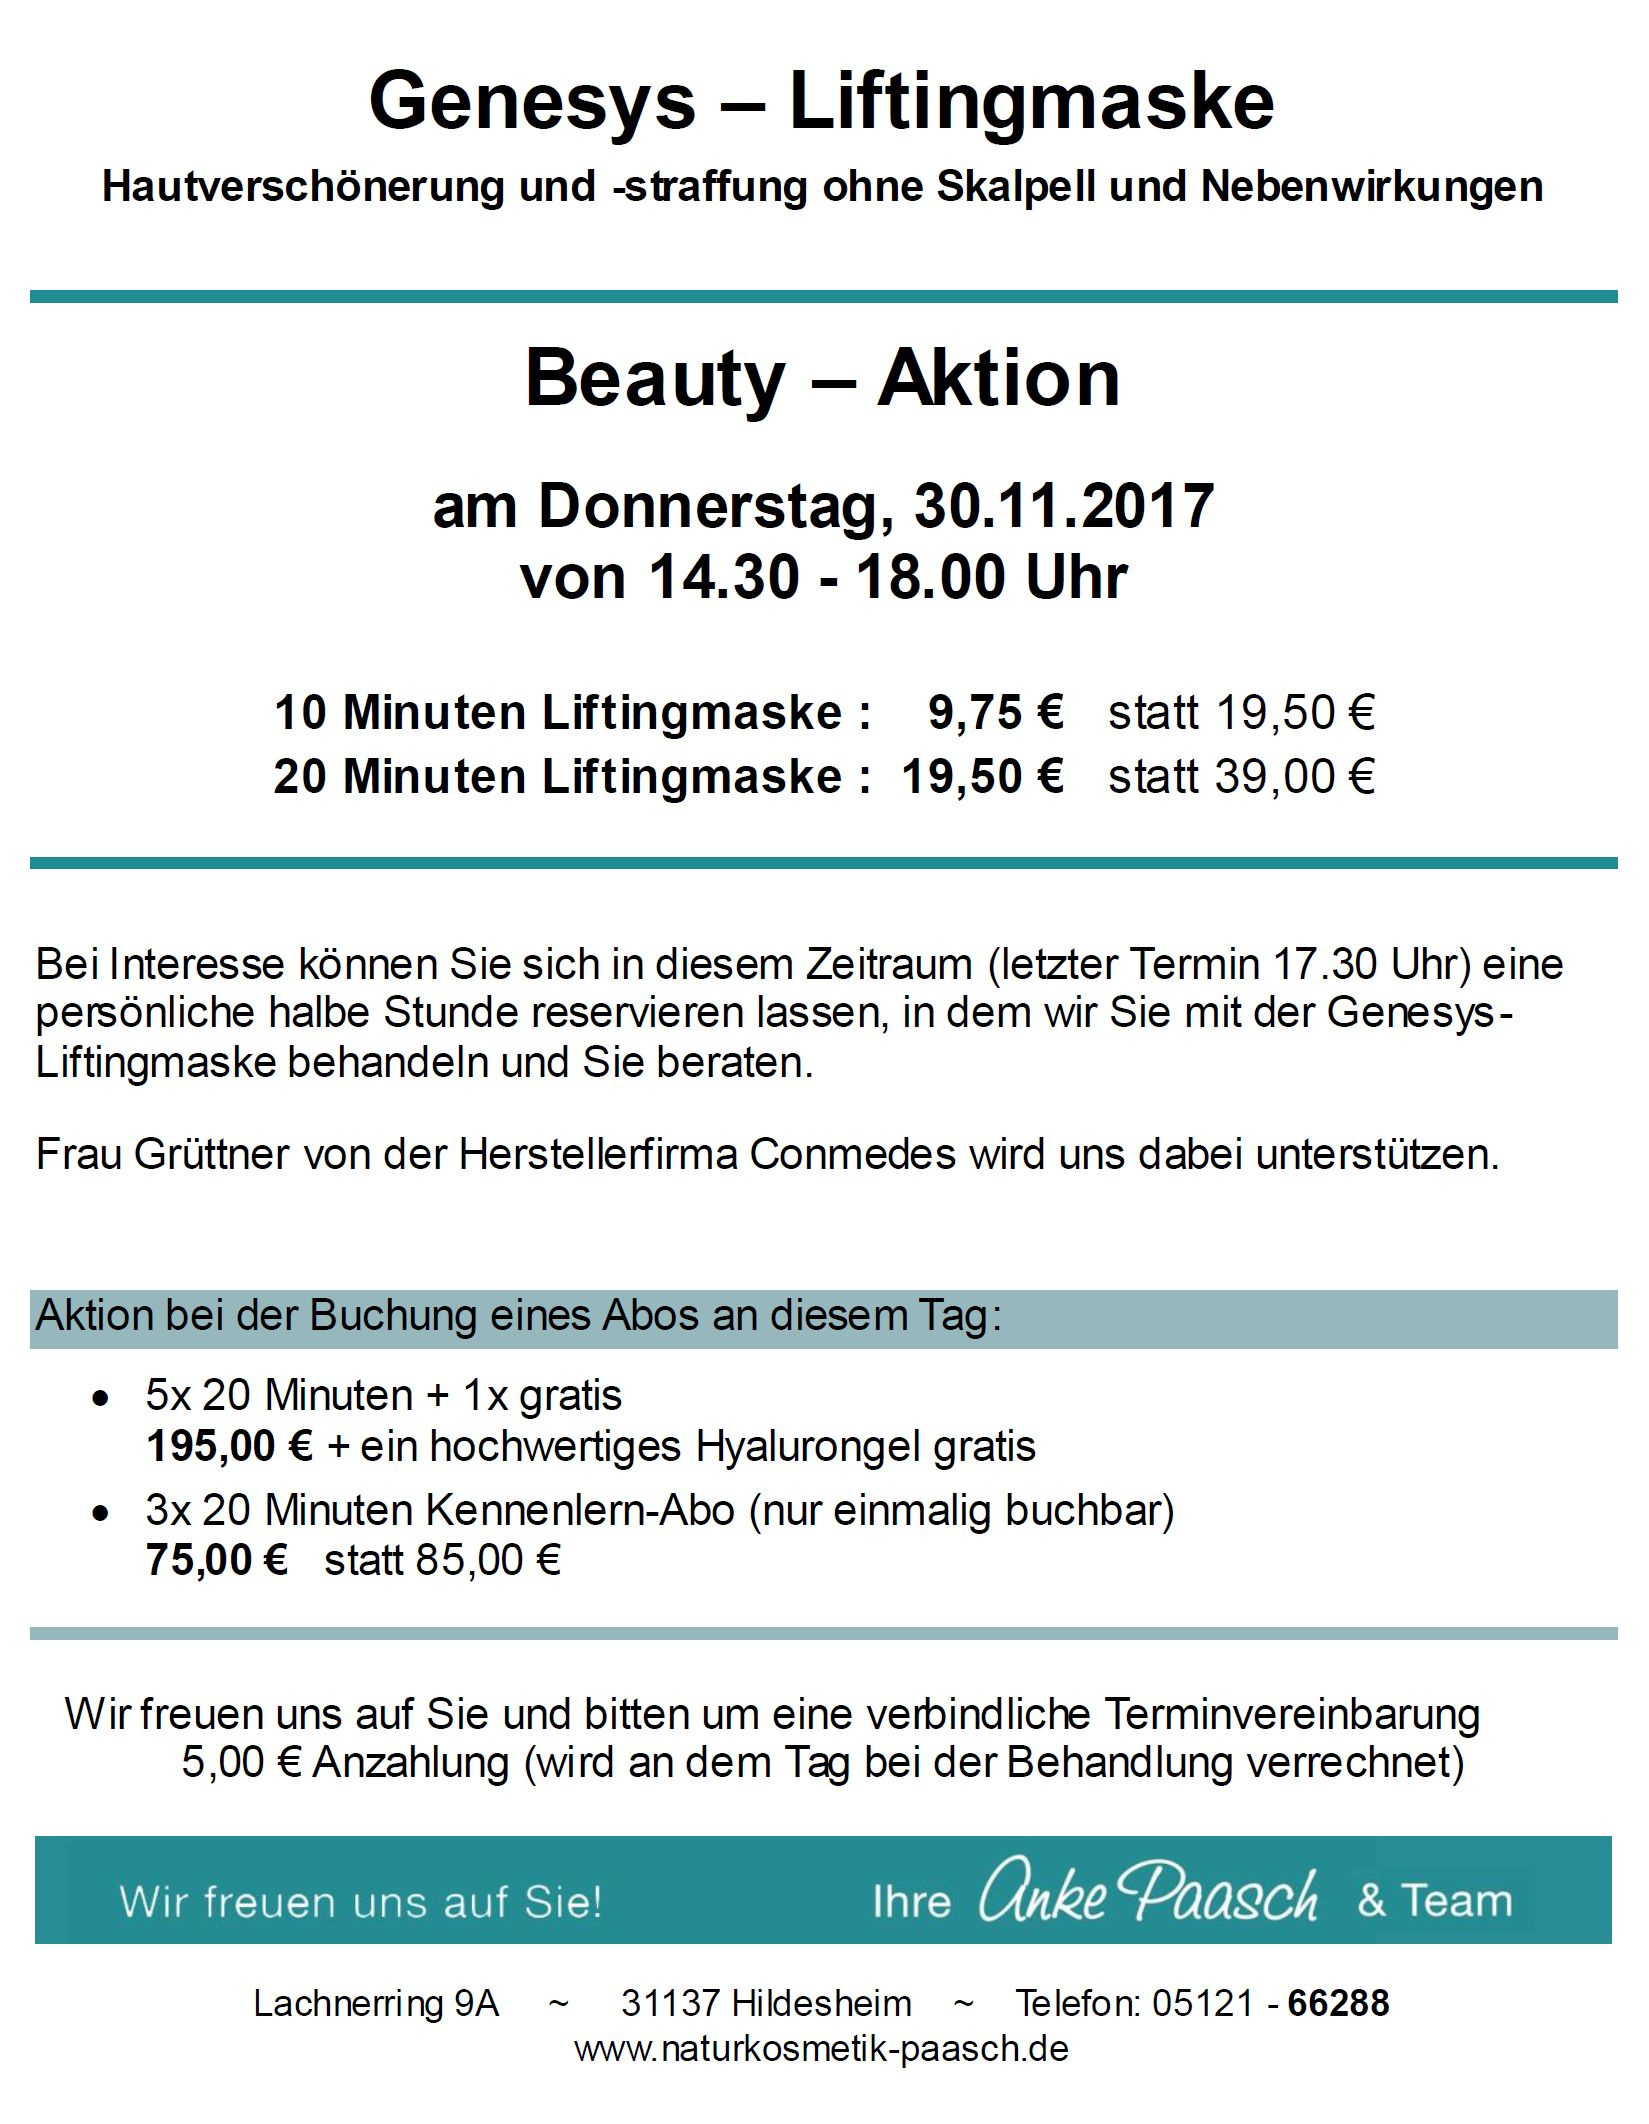 Angebote - Naturkosmetik-Praxis Anke Paasch